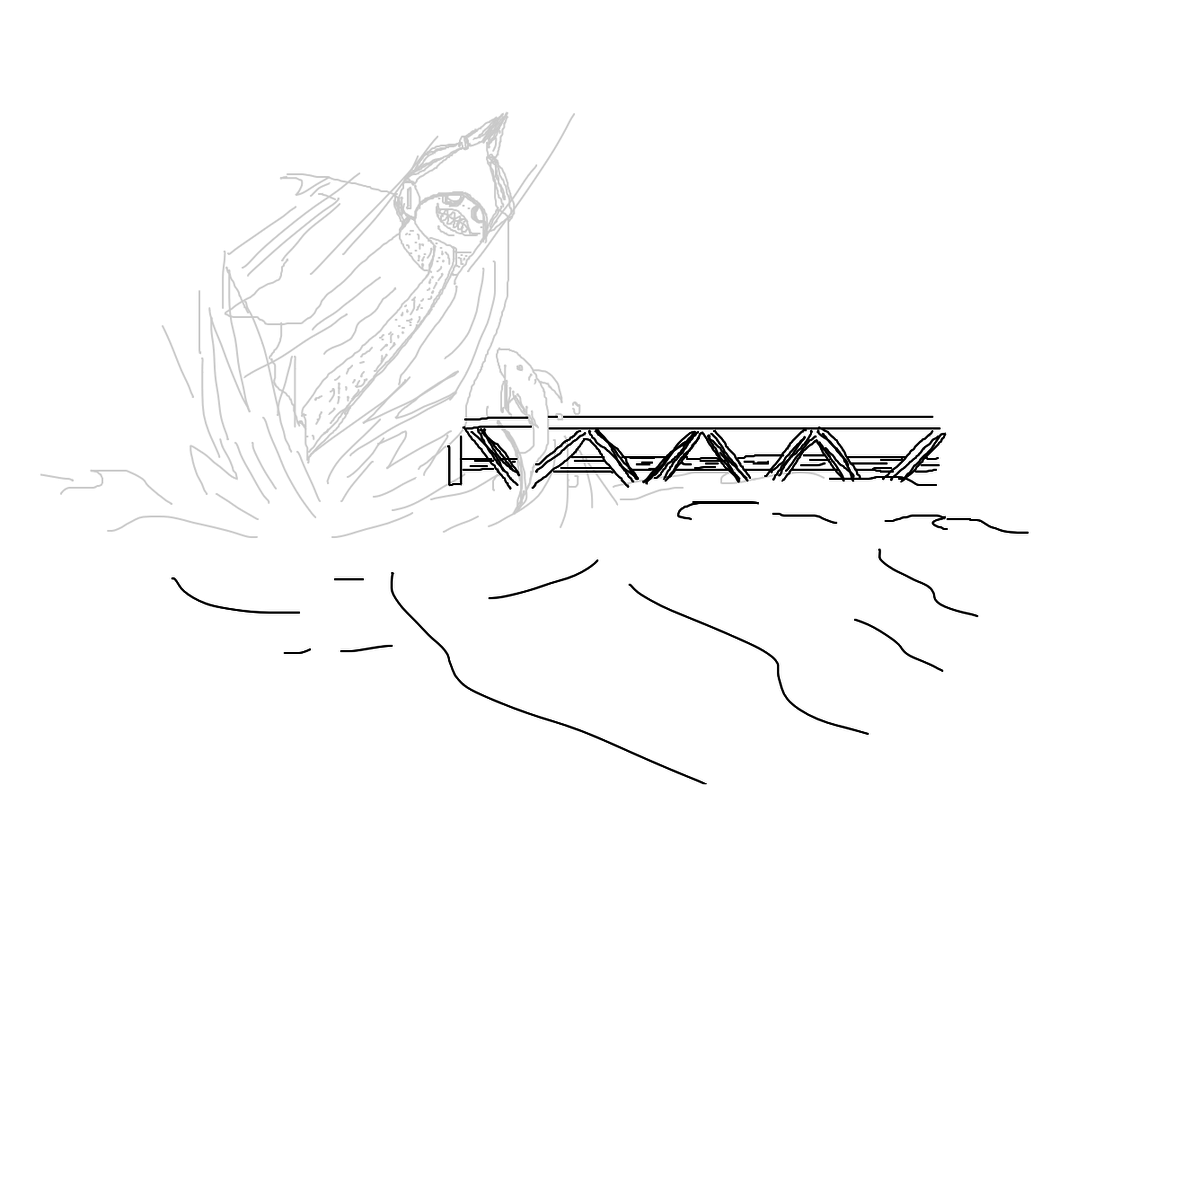 BAAAM drawing#24138 lat:78.4175643920898400lng: -4.4388723373413090